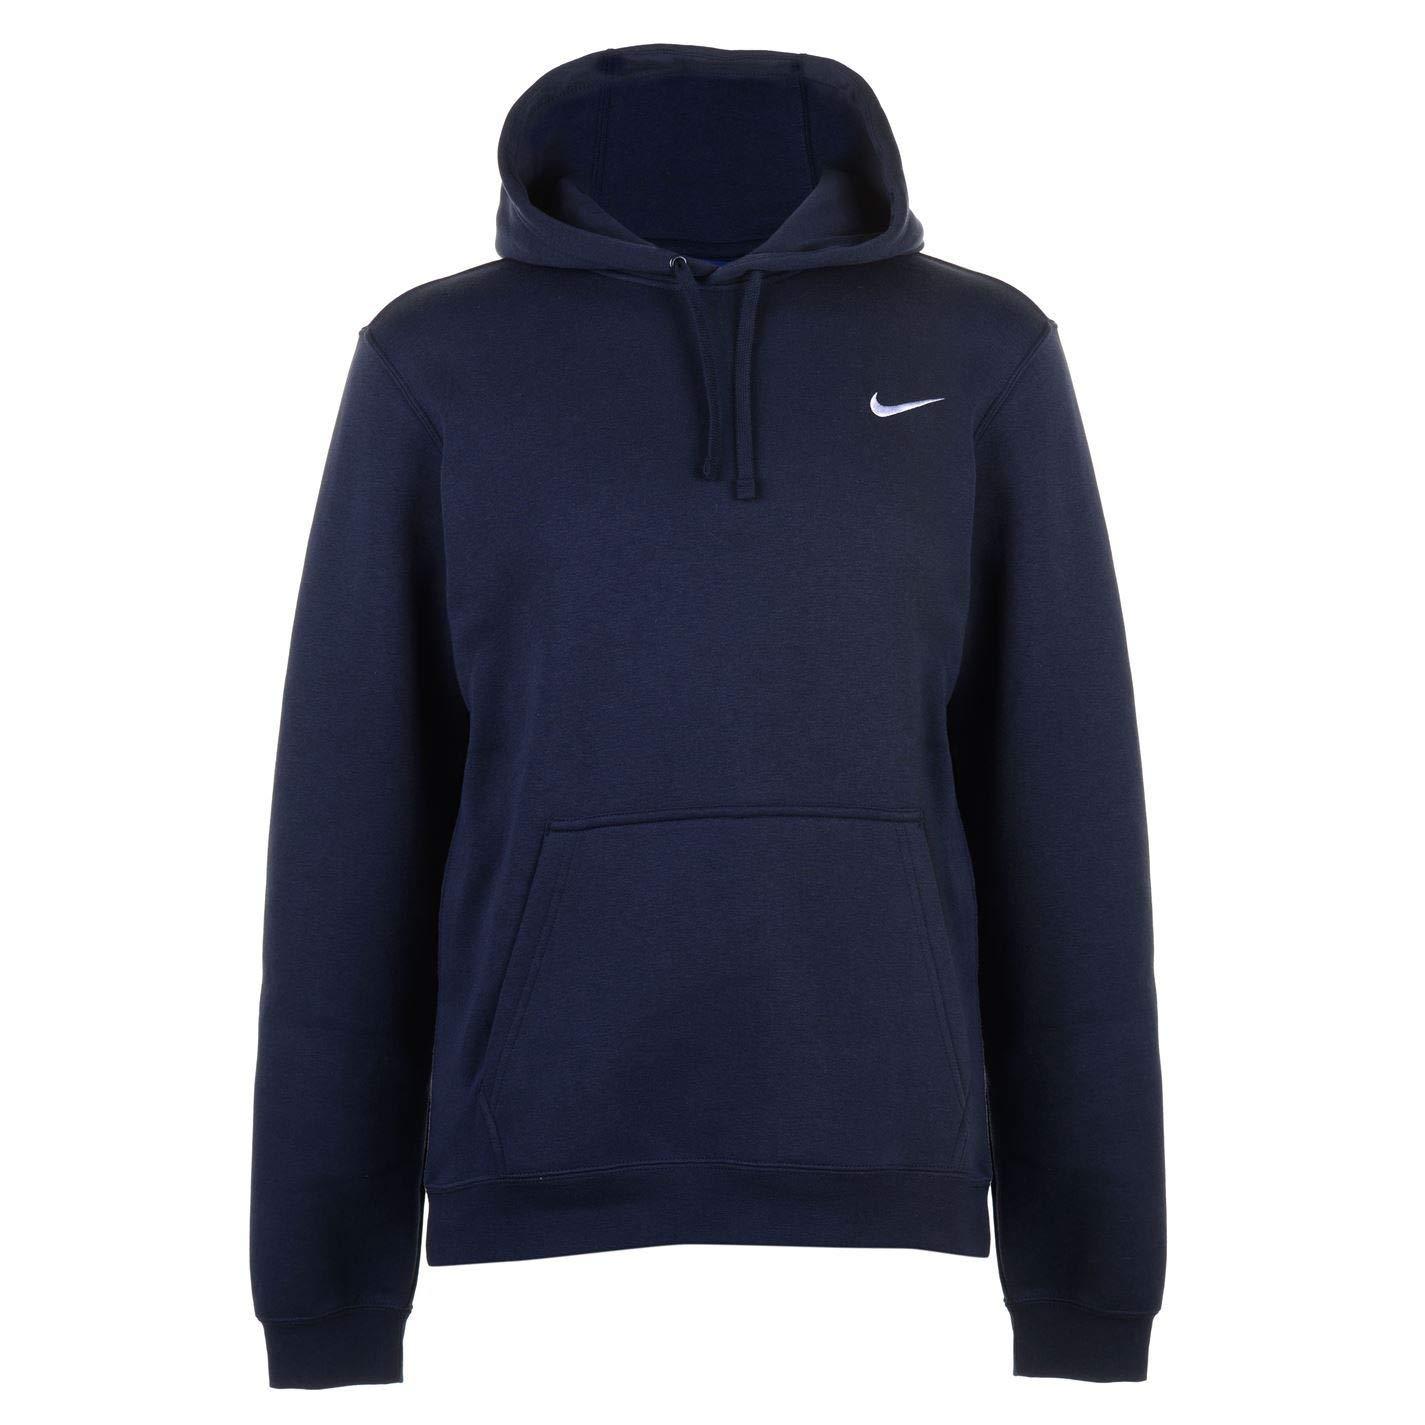 b790edf907e1 Nike Fundamentals Fleece Lined Pullover Hoody Mens OTH Hoodie Sweatshirt  Sweater at Amazon Men s Clothing store